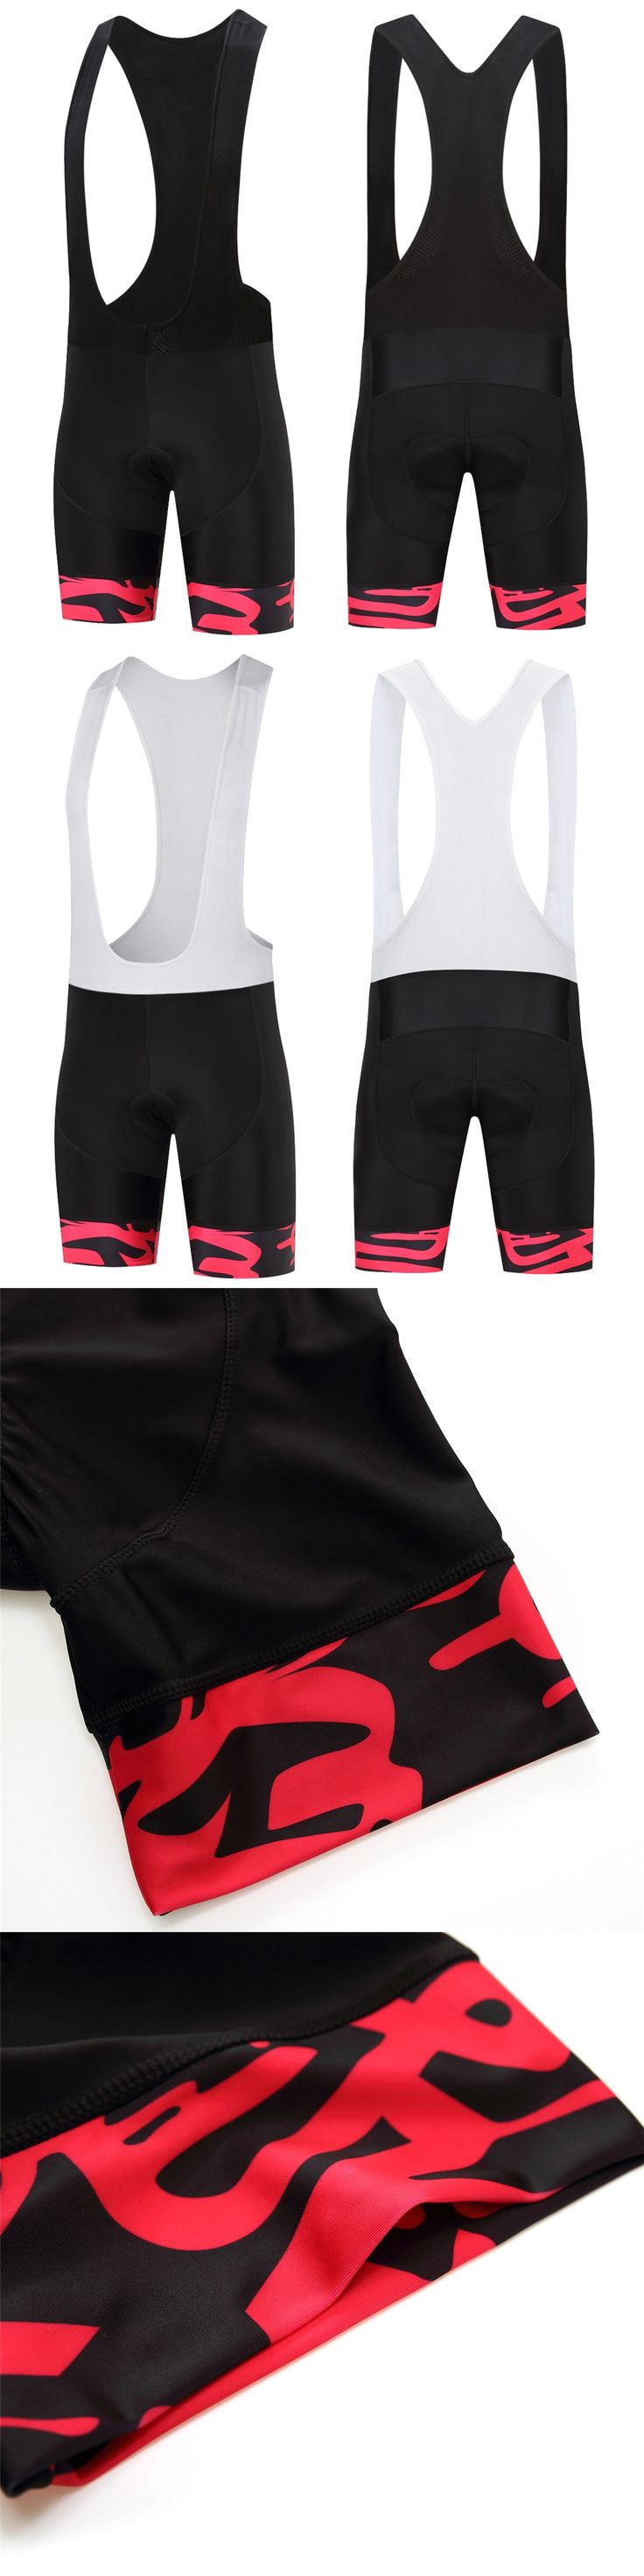 FUALRNY Black Cycling Bib Shorts PRO TEAM Race Lightweight Cycling/Bike Shorts Bottom Italy grippers at leg High density 9D PAD